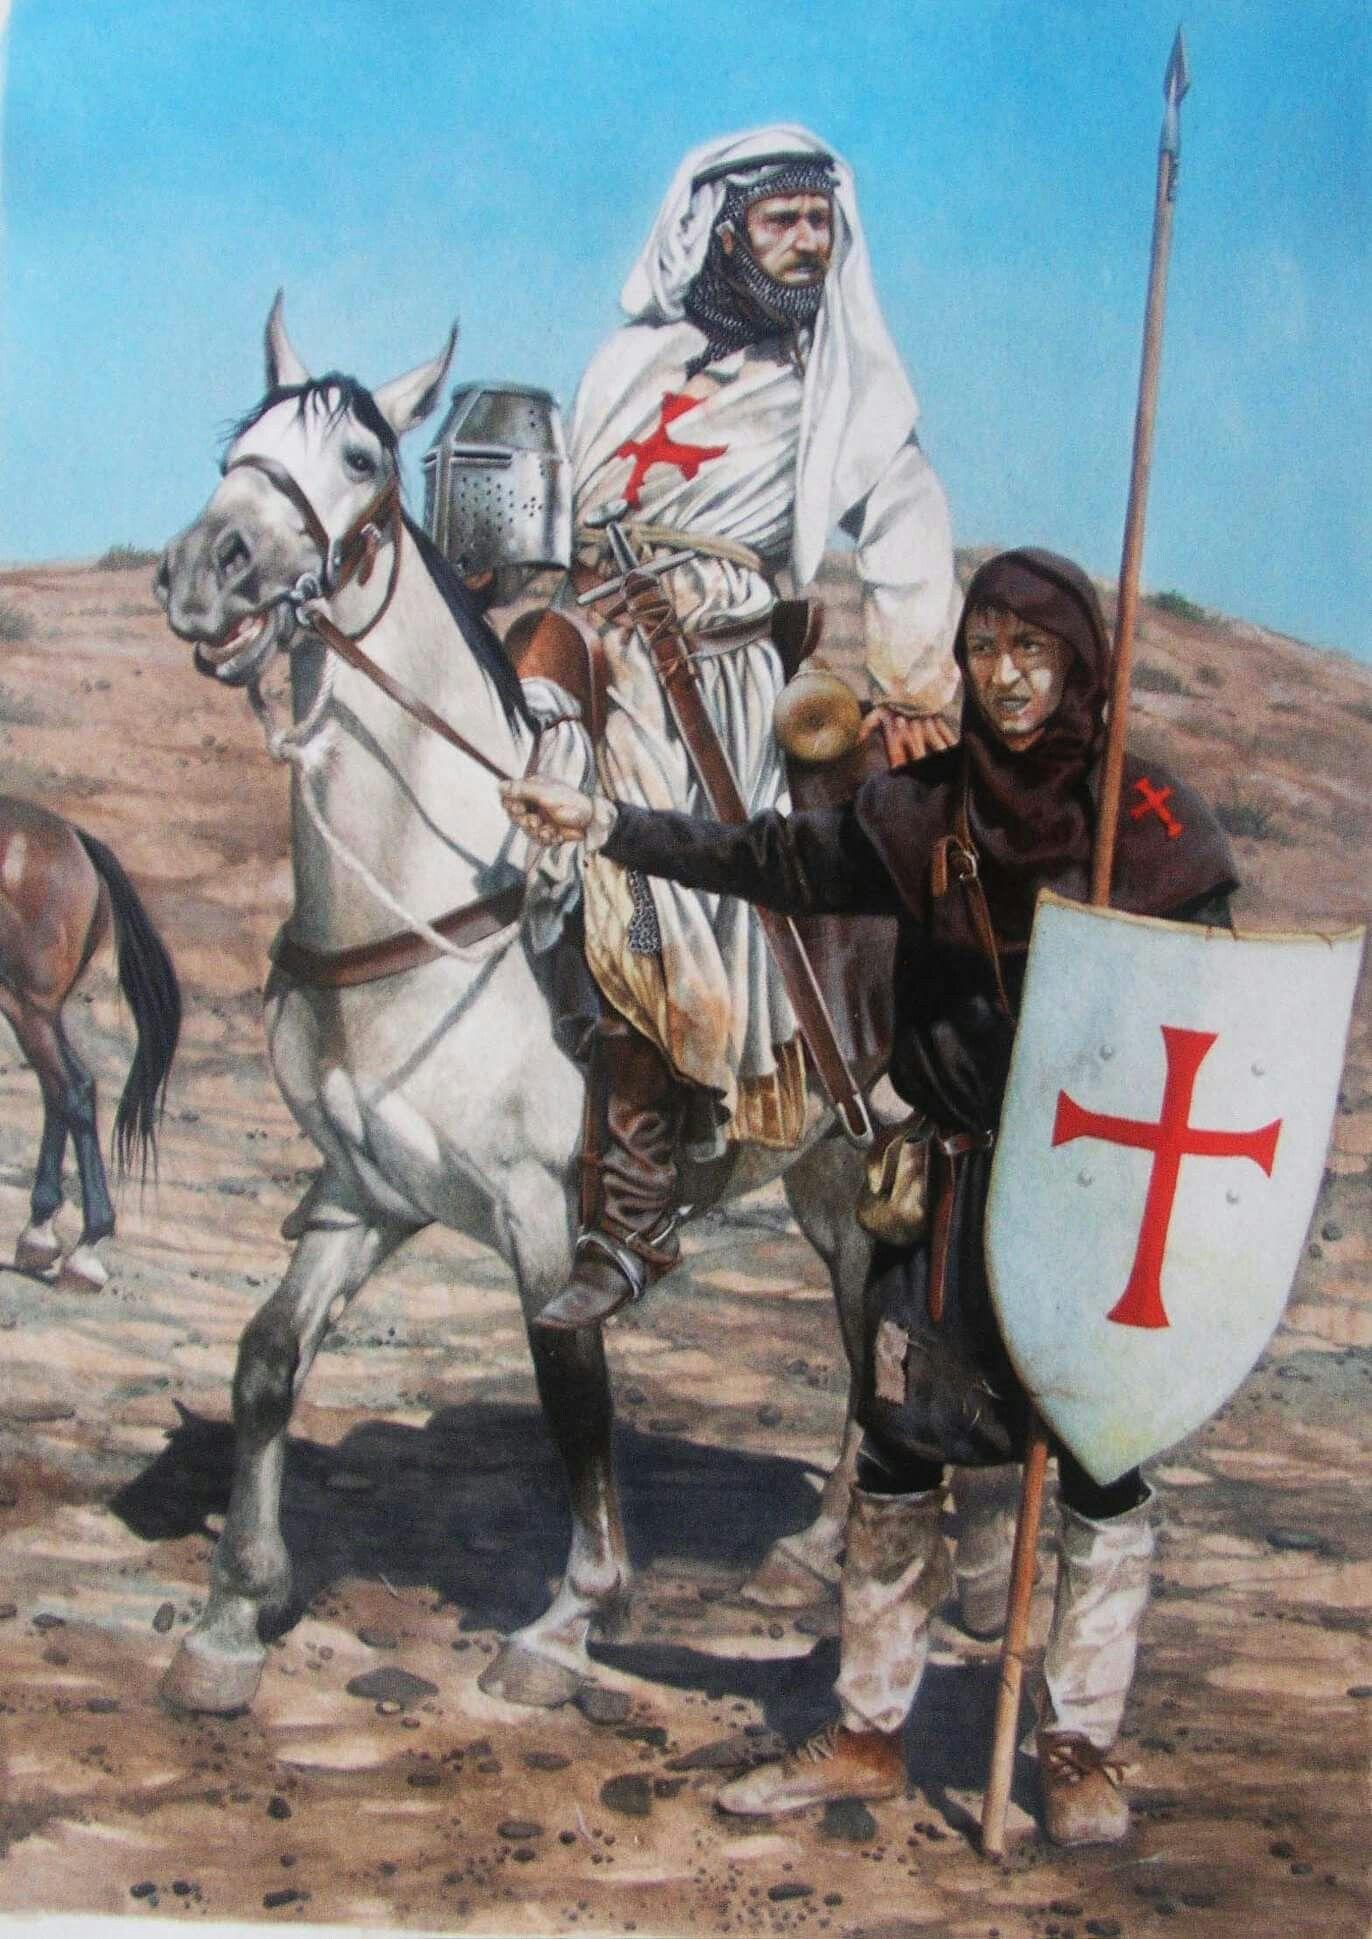 pin by real crusaders on crusades stuff pinterest knights